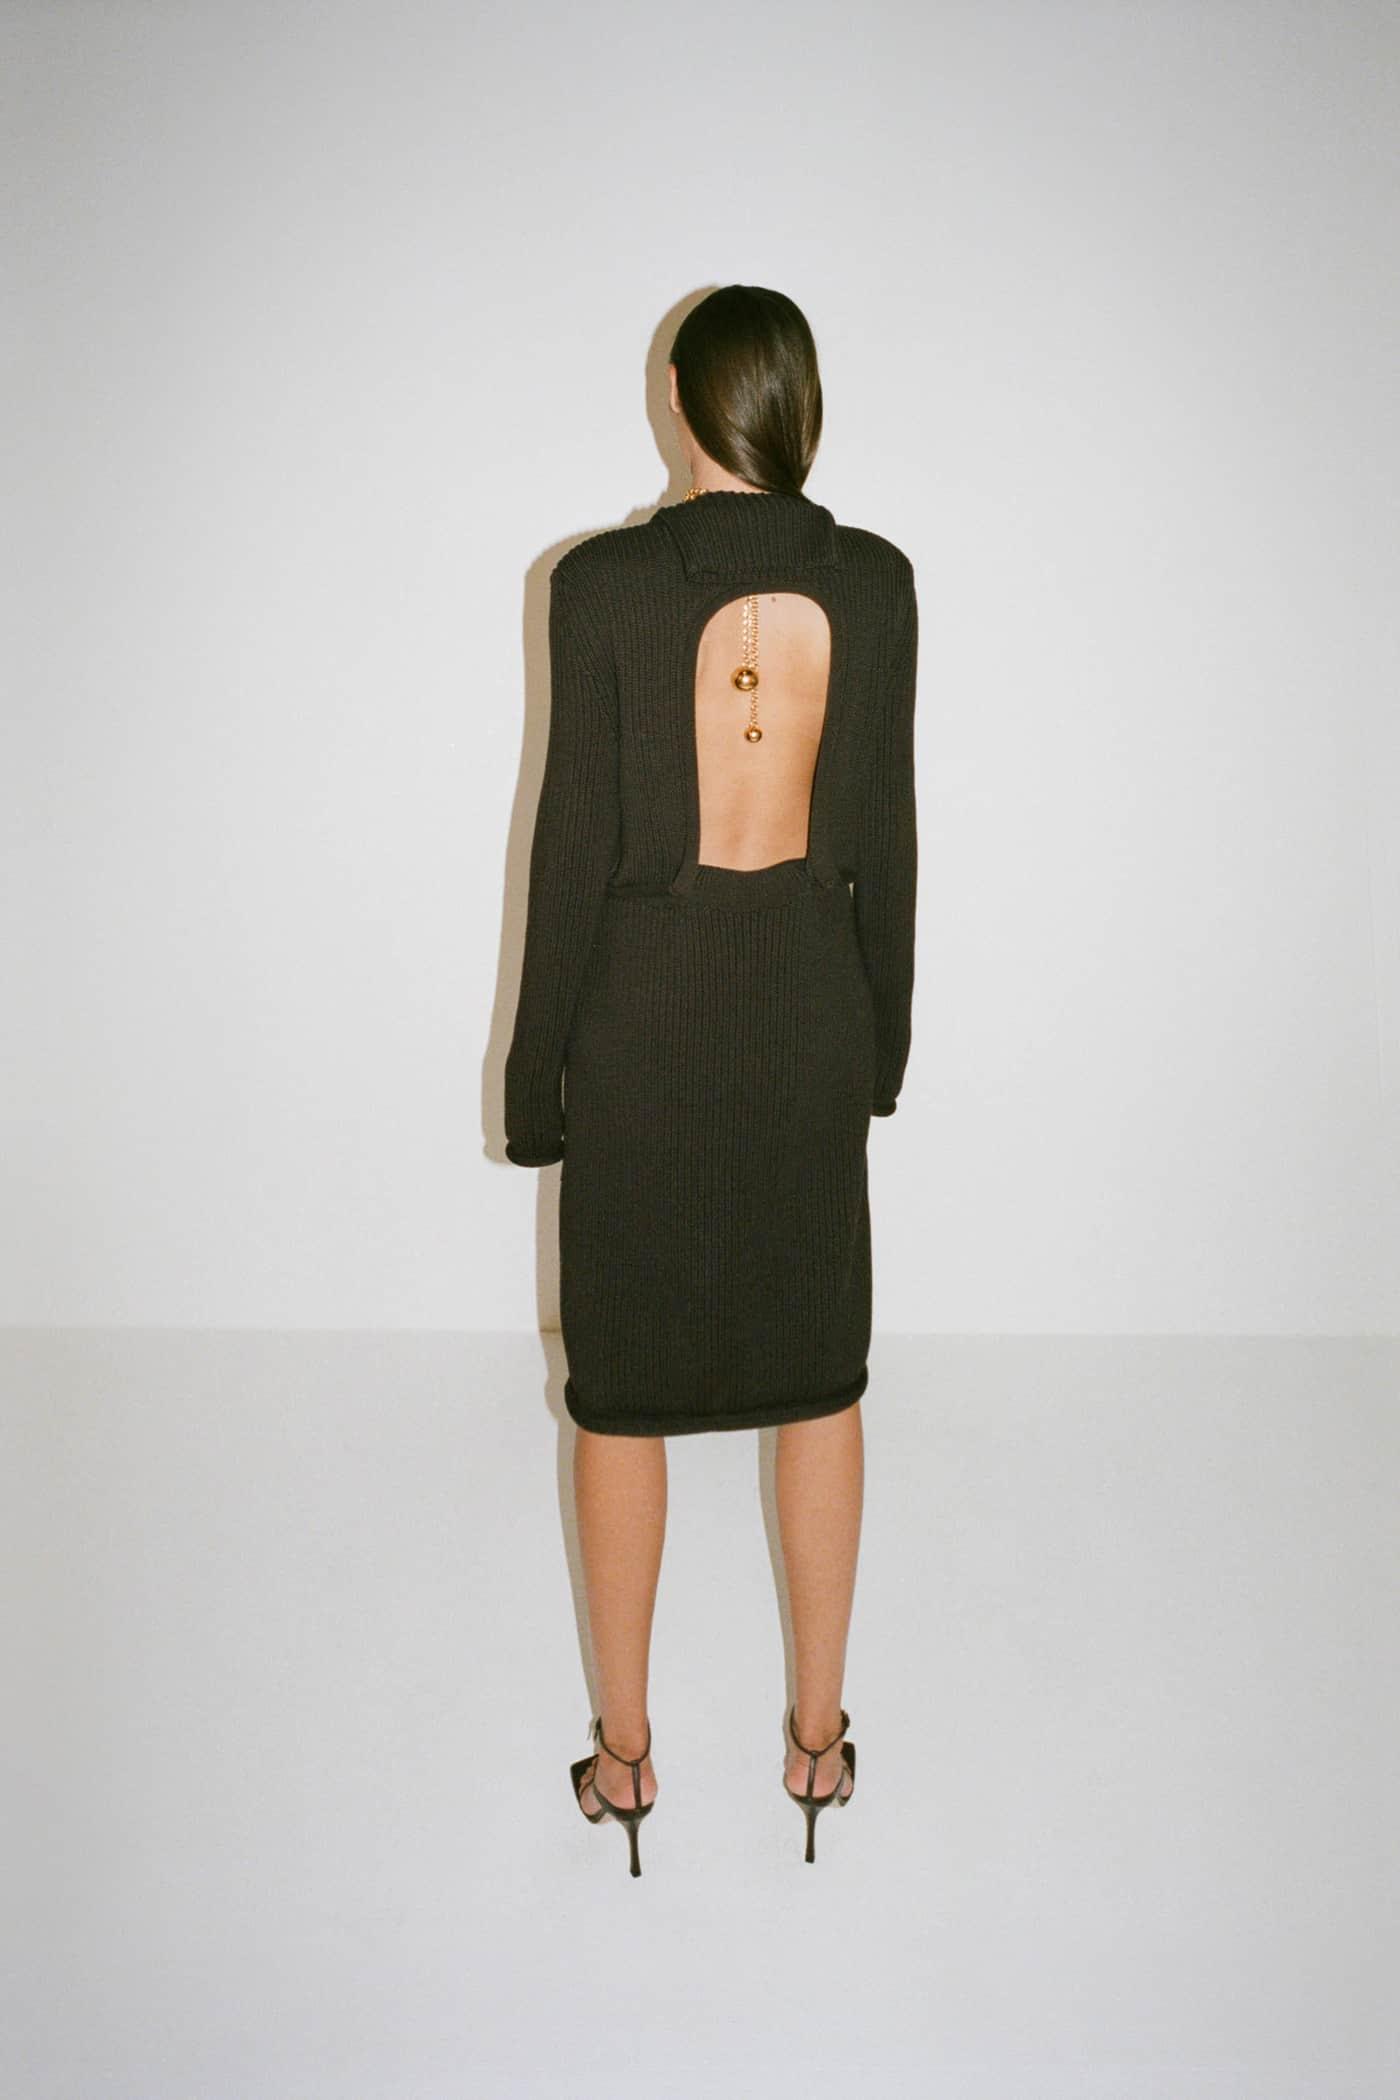 Daniel Lee Unveils His First Collection for Bottega Veneta 35827f8519dc8